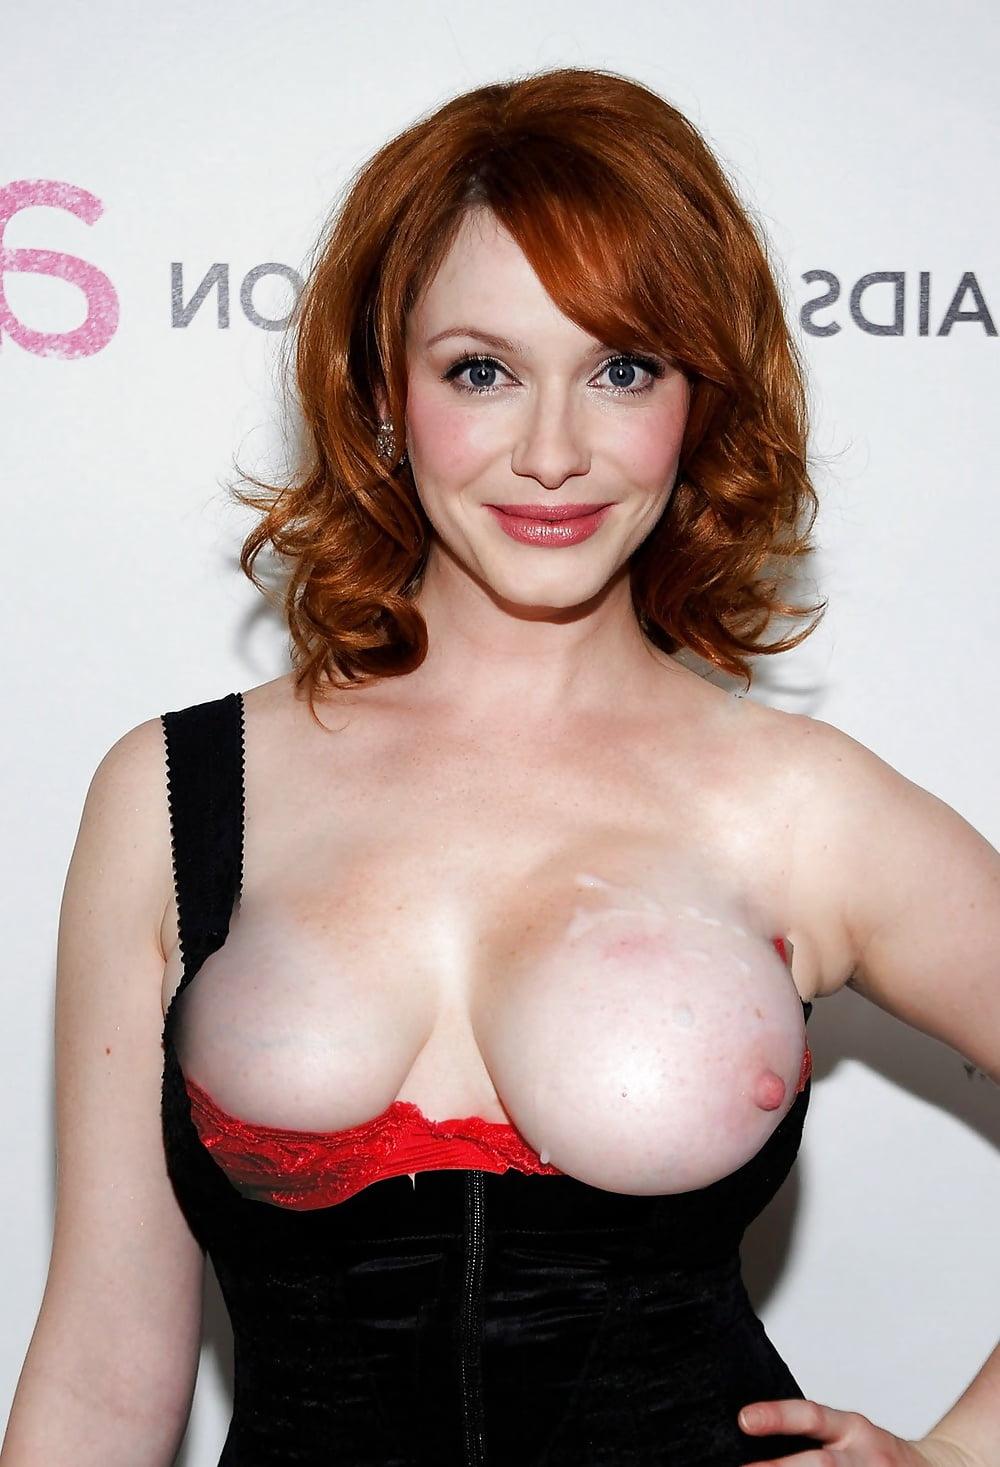 Big tits celebrities — 9